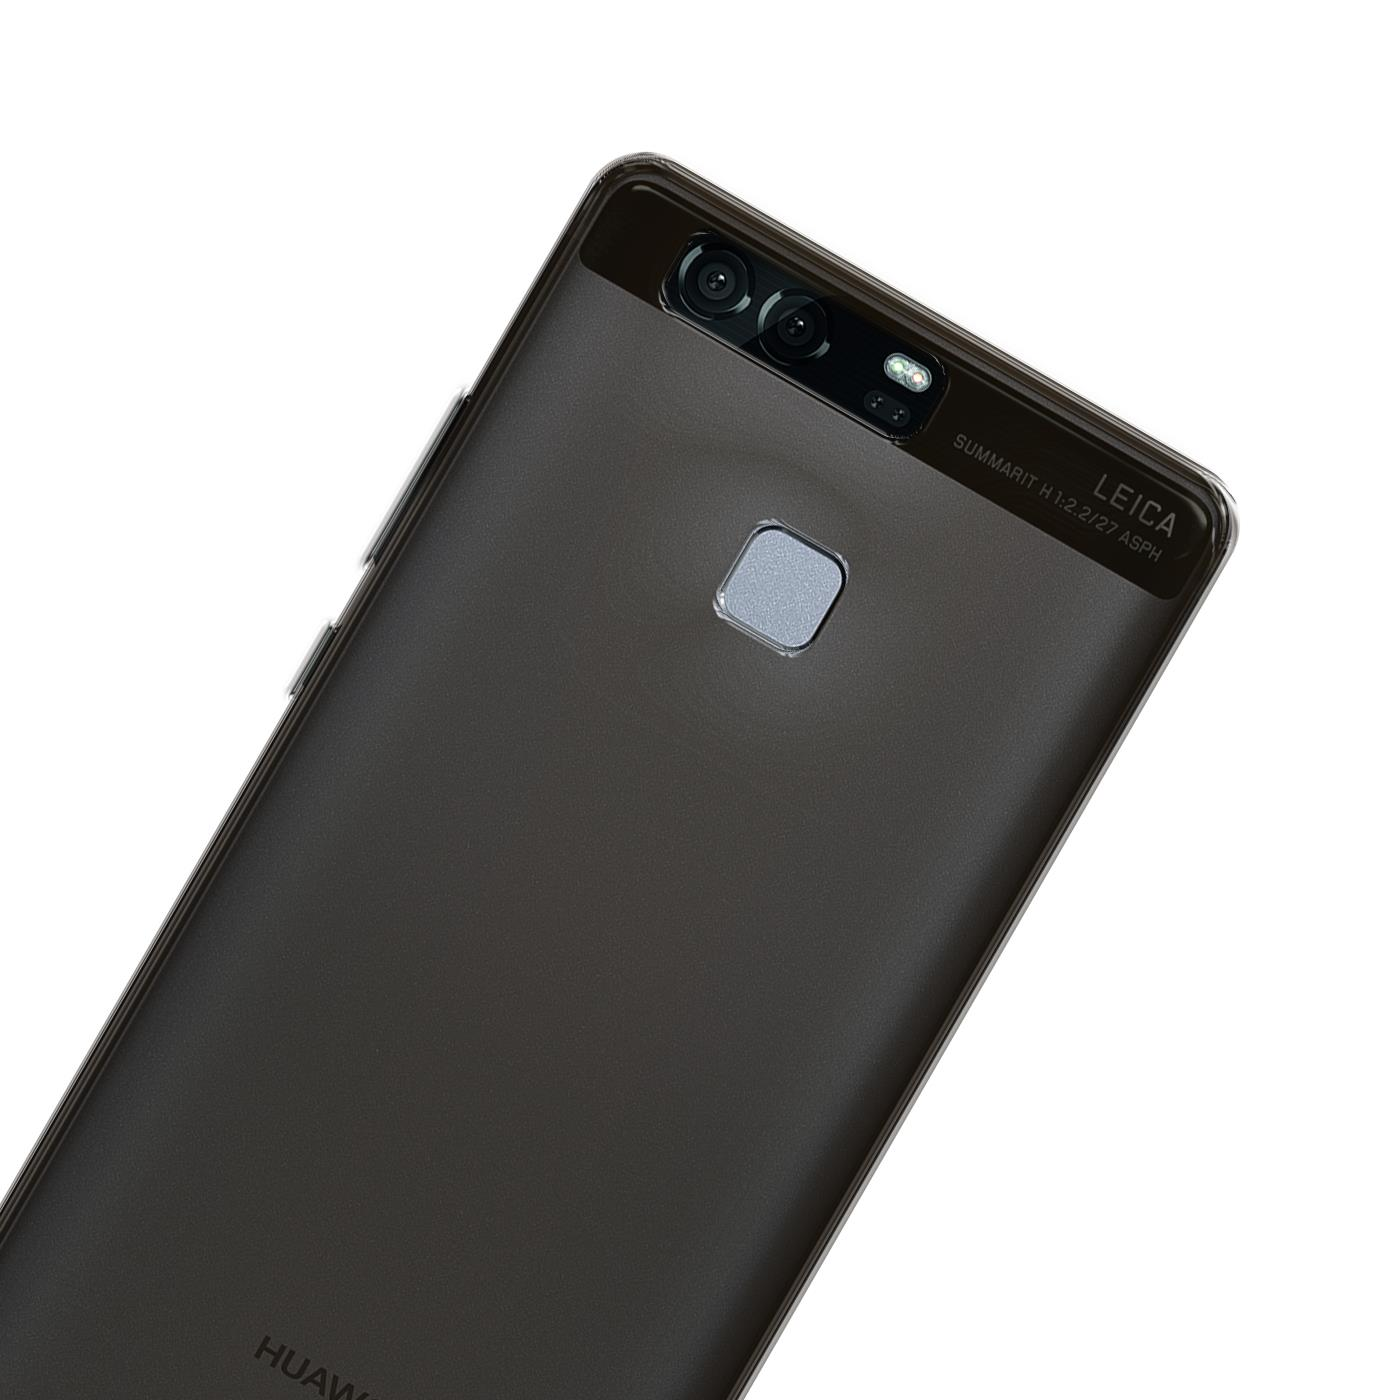 Huawei-p9-Duenn-Silikon-Klar-Case-Cover-Ultra-Slim-Stossfeste-Gel-Rueckseite Indexbild 30